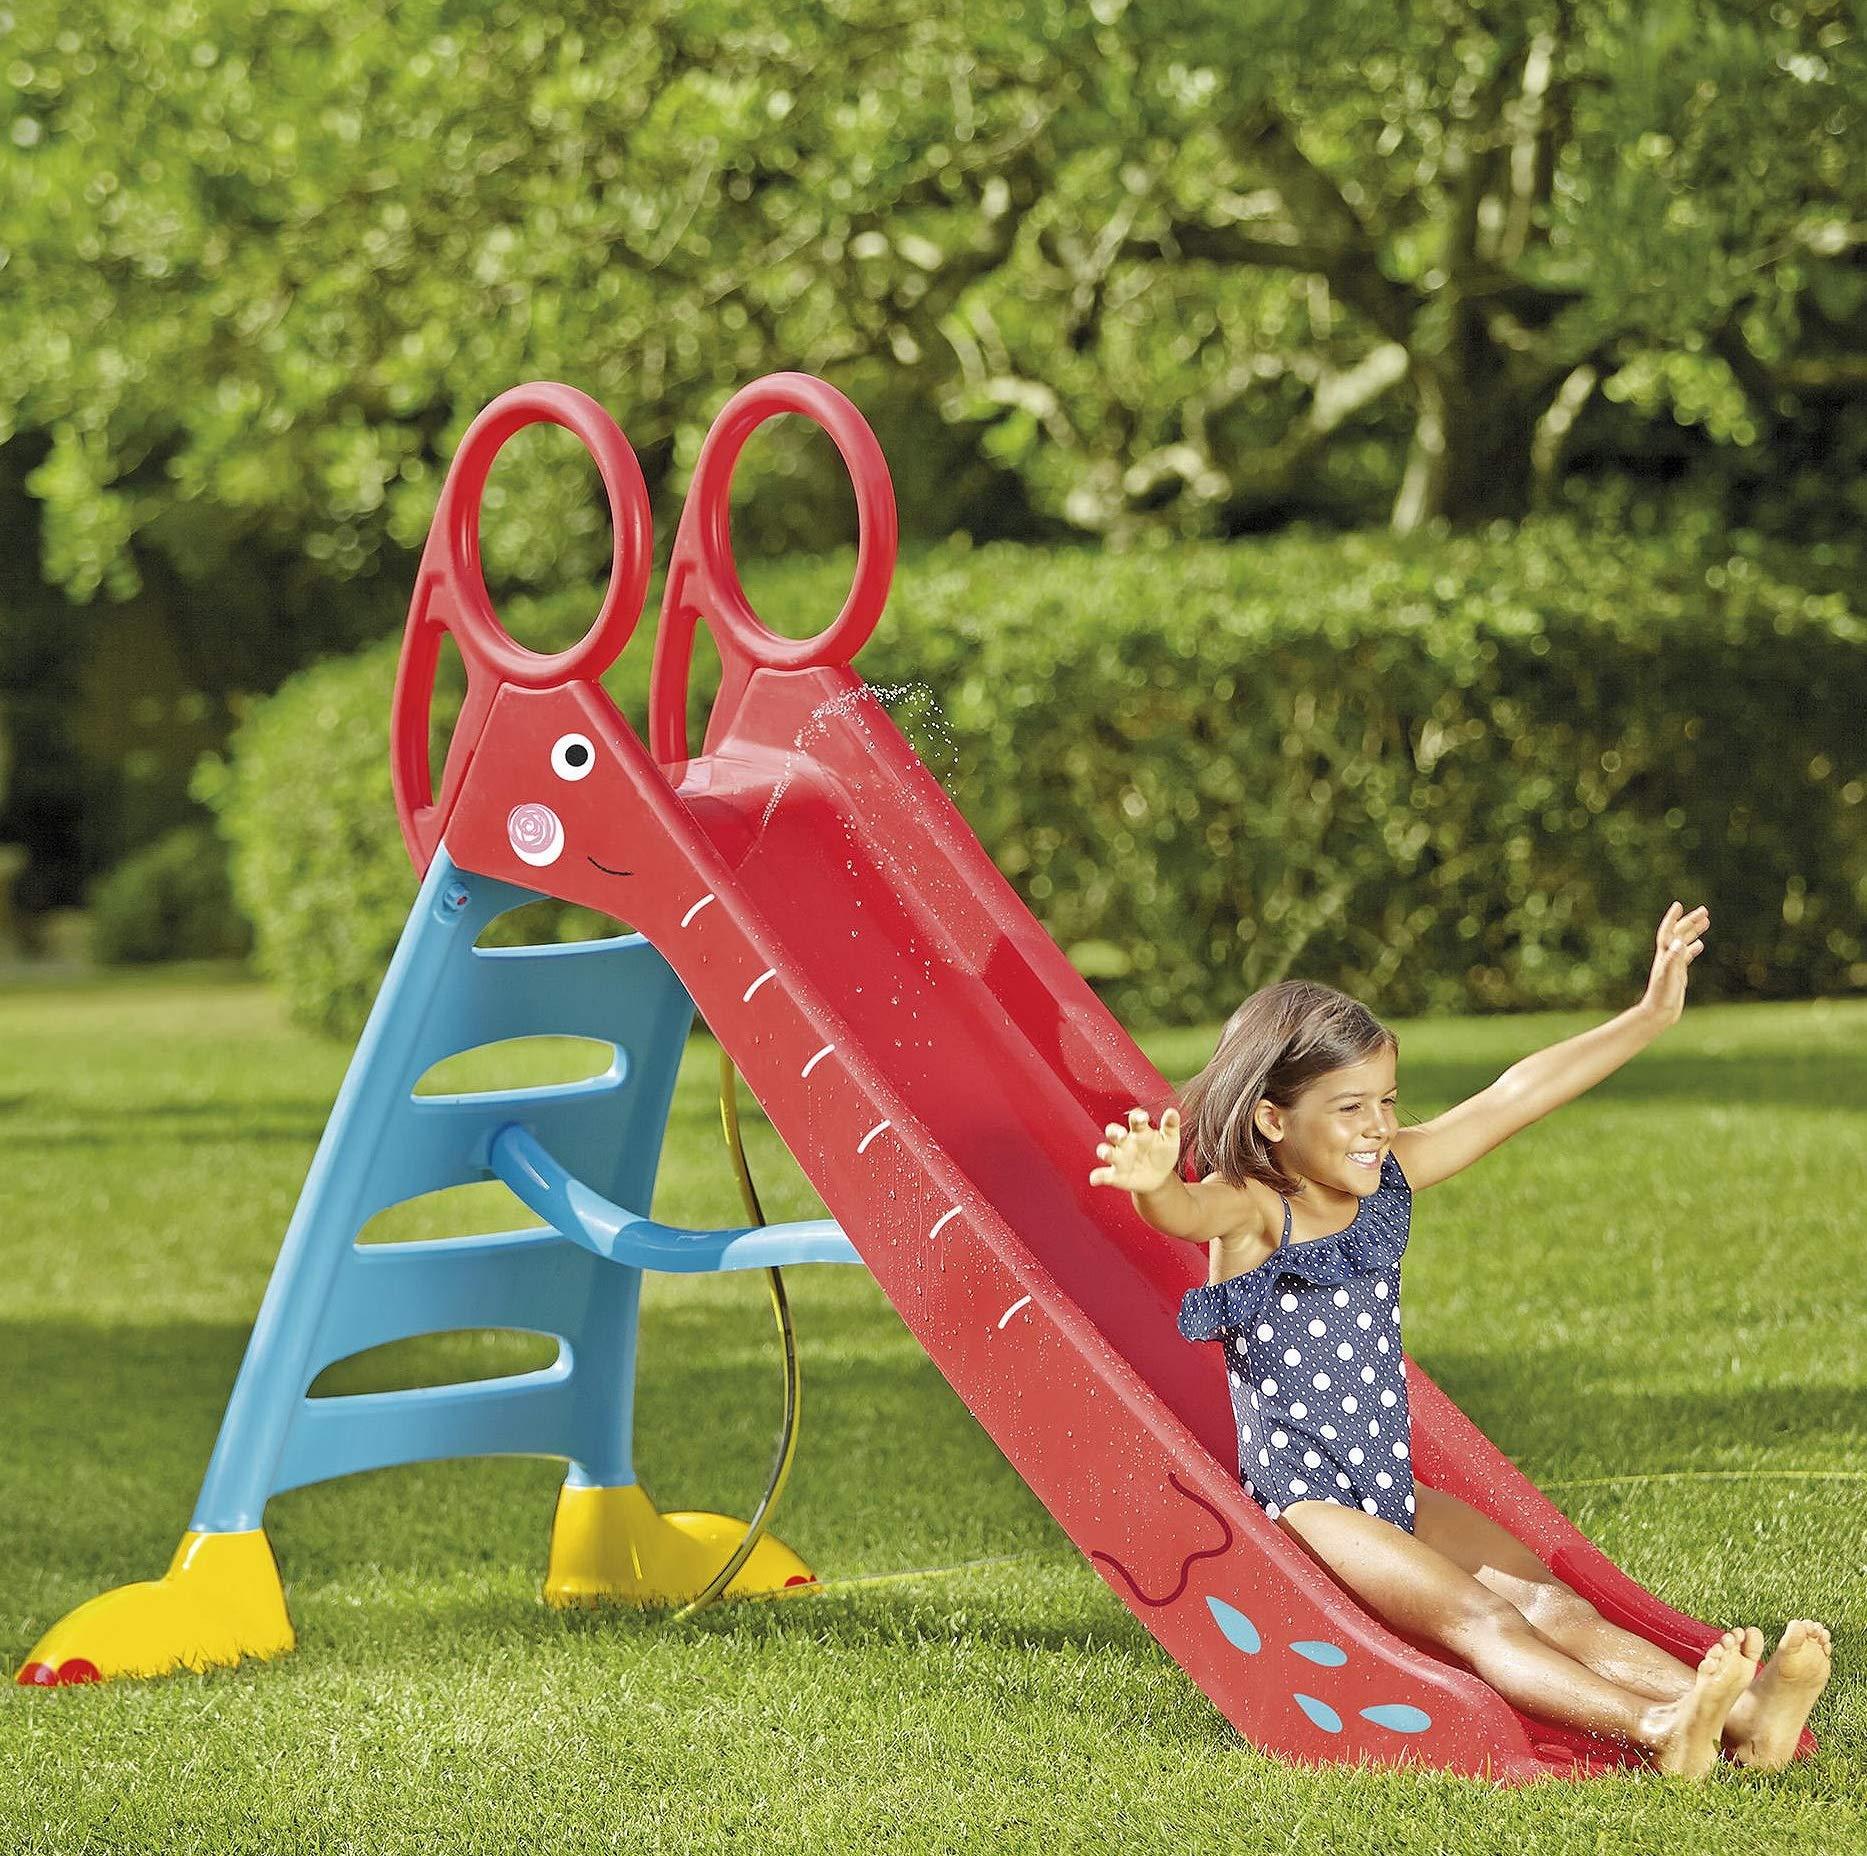 Keny Toys BIG Outdoor Kids Water Garden Slide 190 cm Children slide activity of toys Free-standing children slide PINK Made in EU